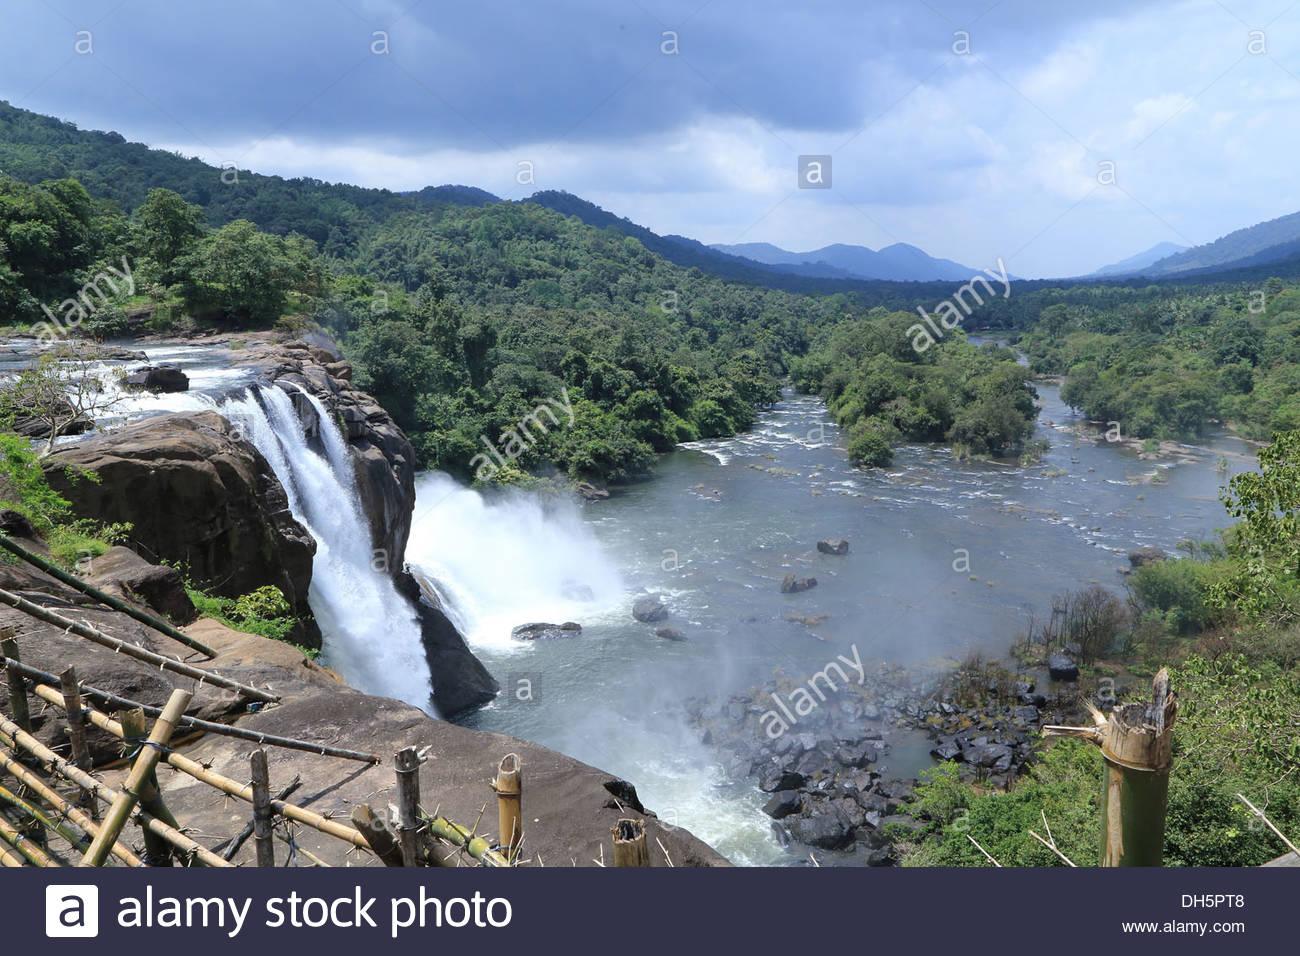 Athirappilly Falls, Kerala, India Stock Photo, Royalty Free Image.